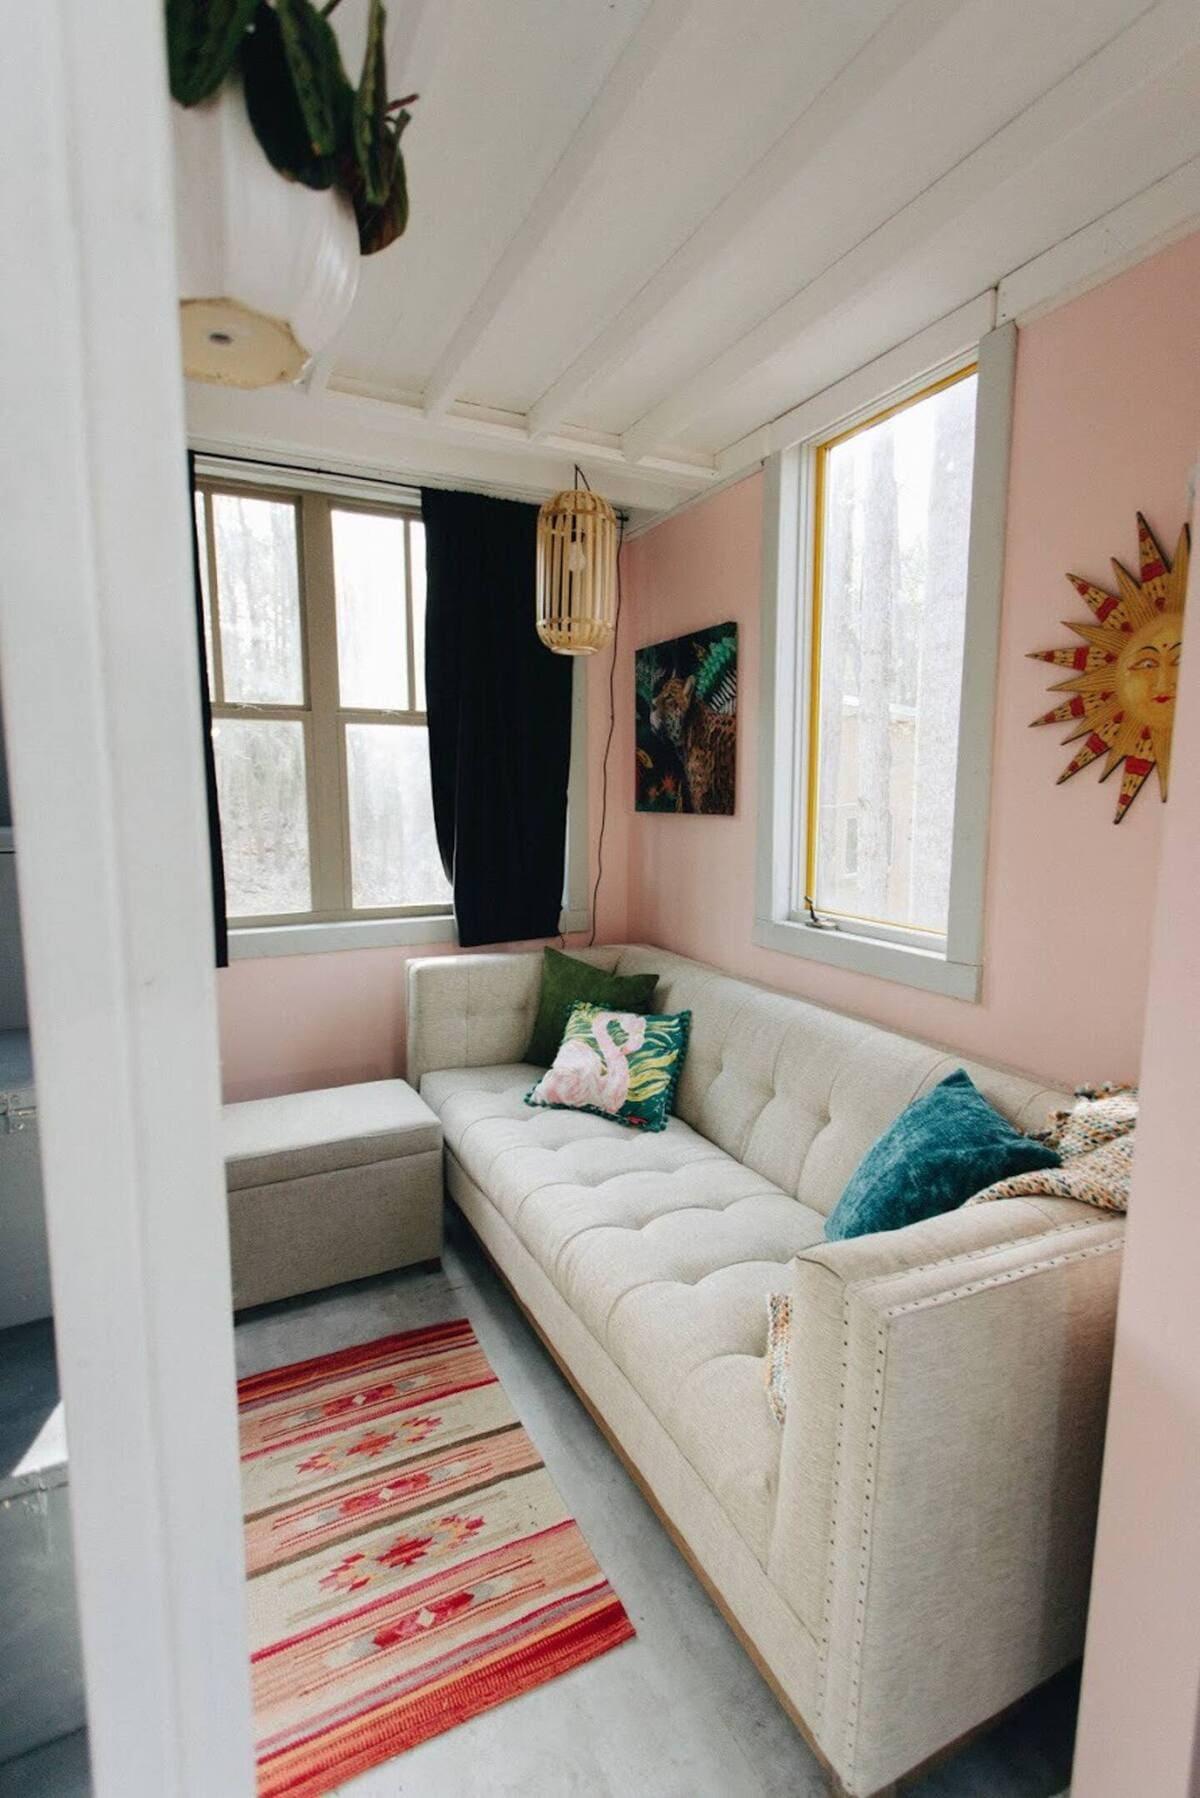 tiny house hola 6 - Tropical tiny house offers visitors a creative getaway